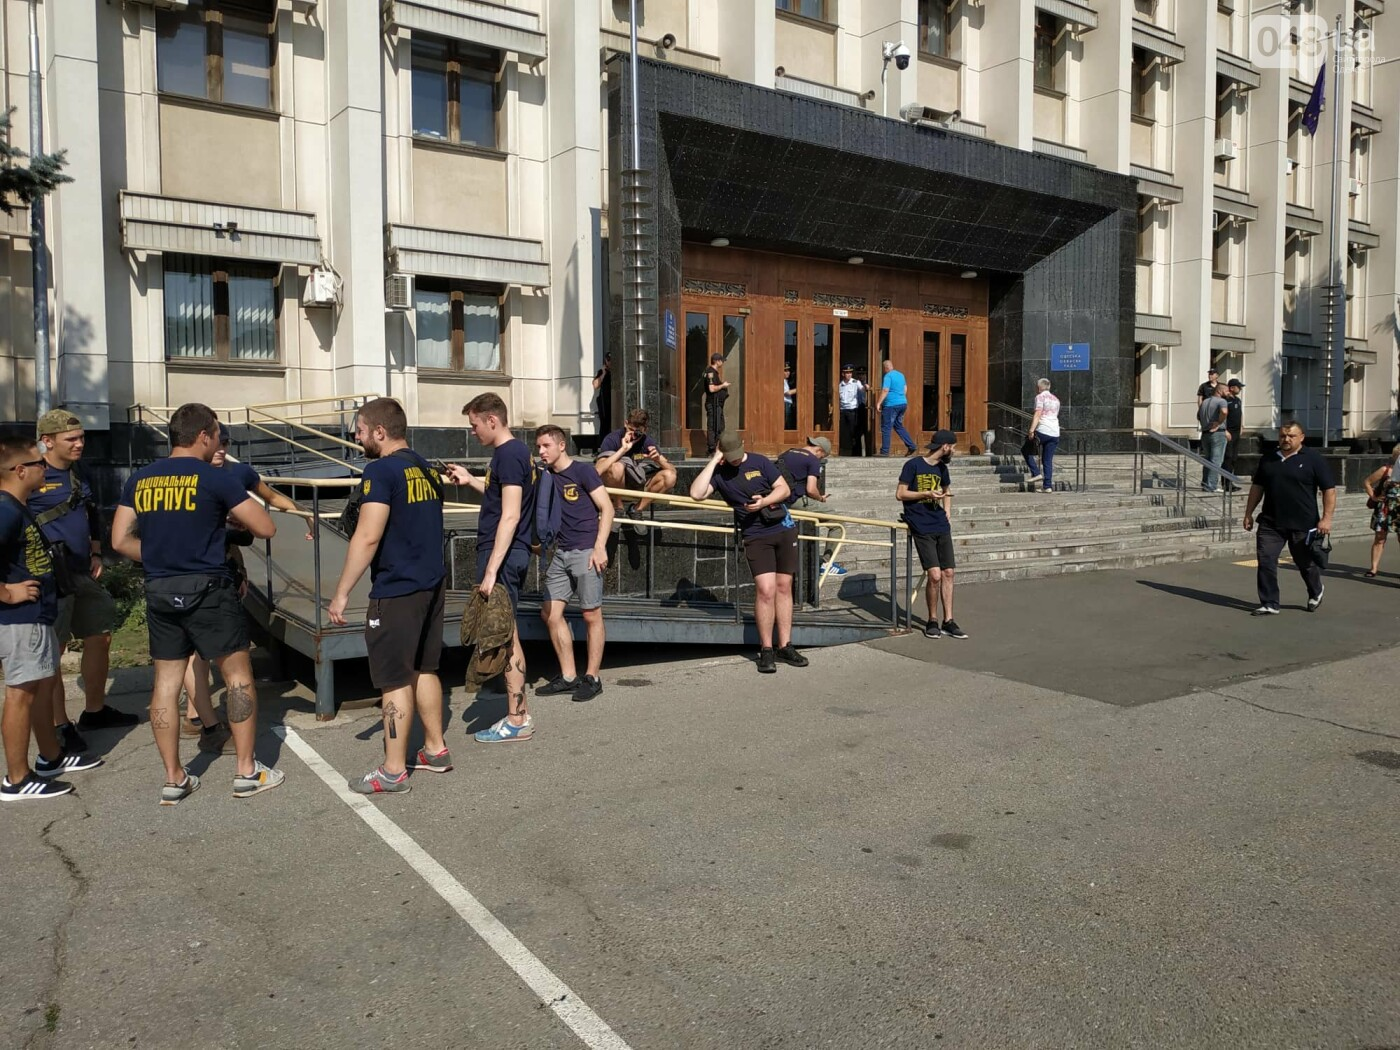 Стало известно, кто возглавил Одесский областной совет, - ФОТО, фото-10, Фото: Александр Жирносенко